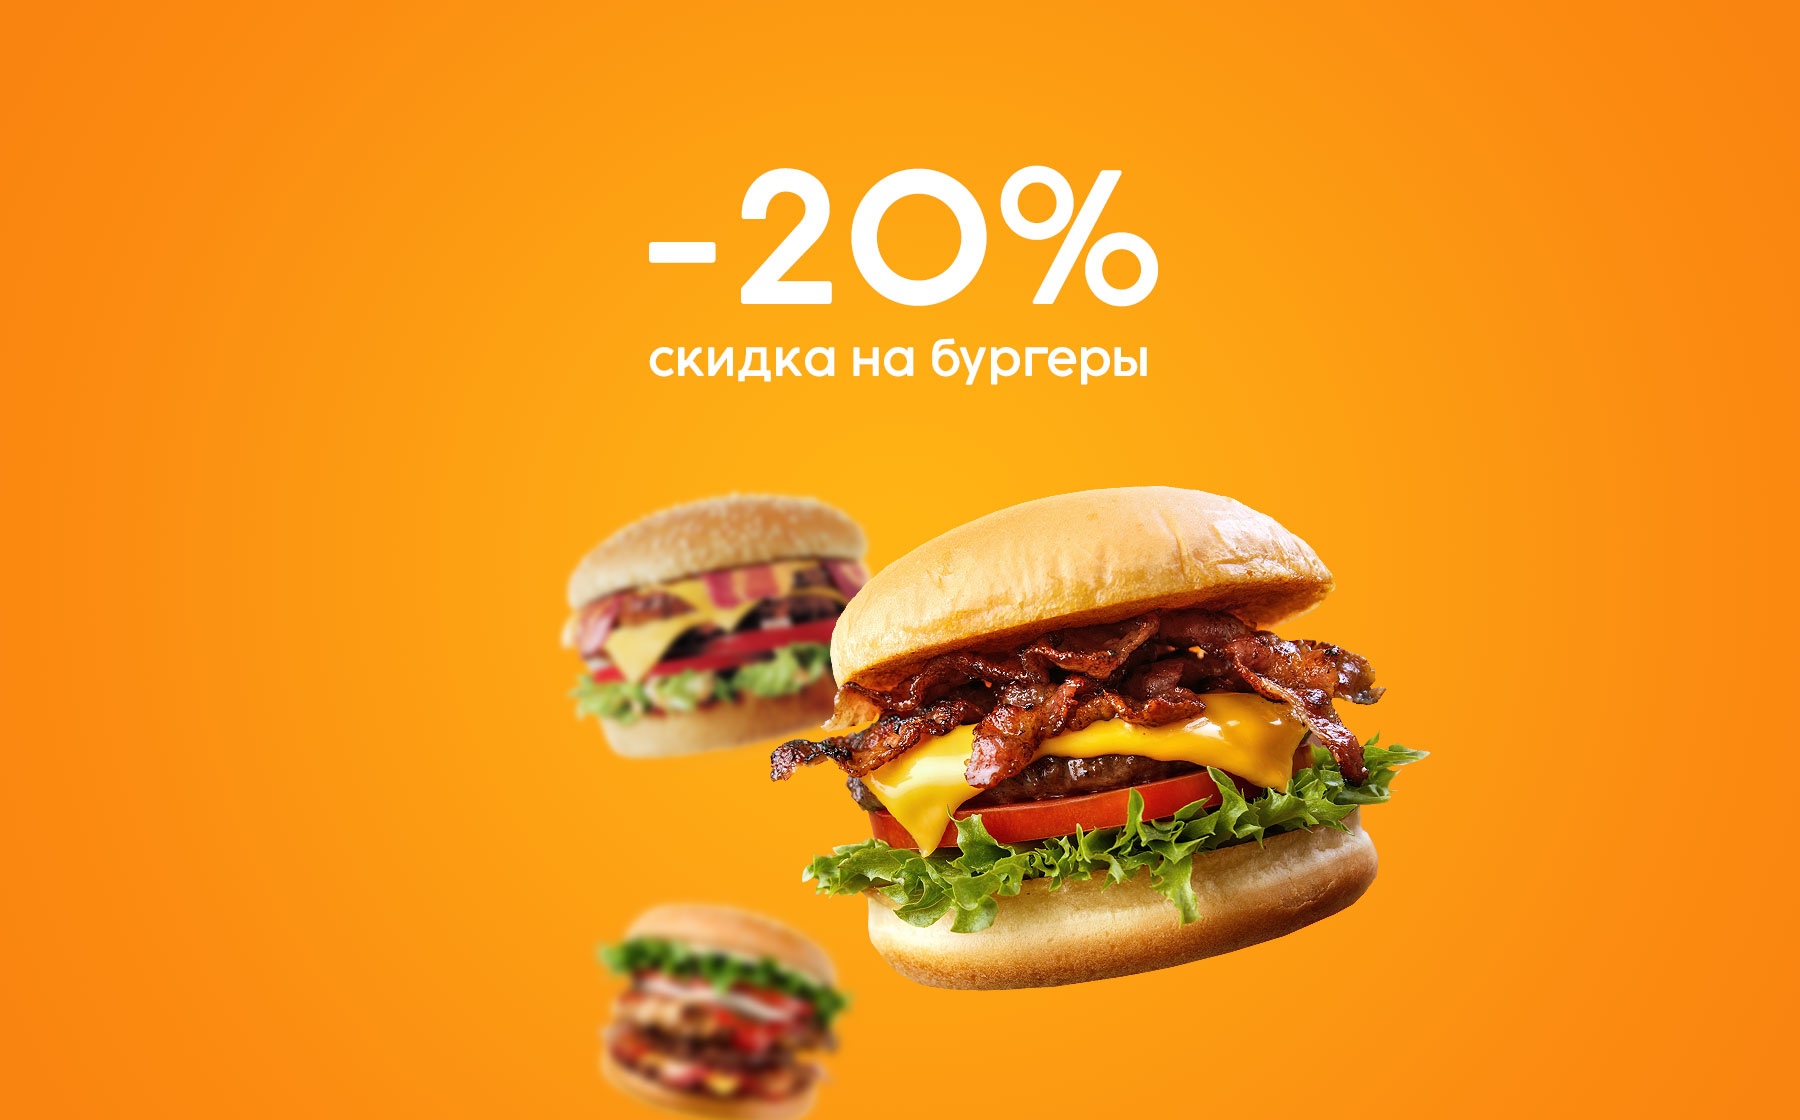 -20% Скидка на бургеры